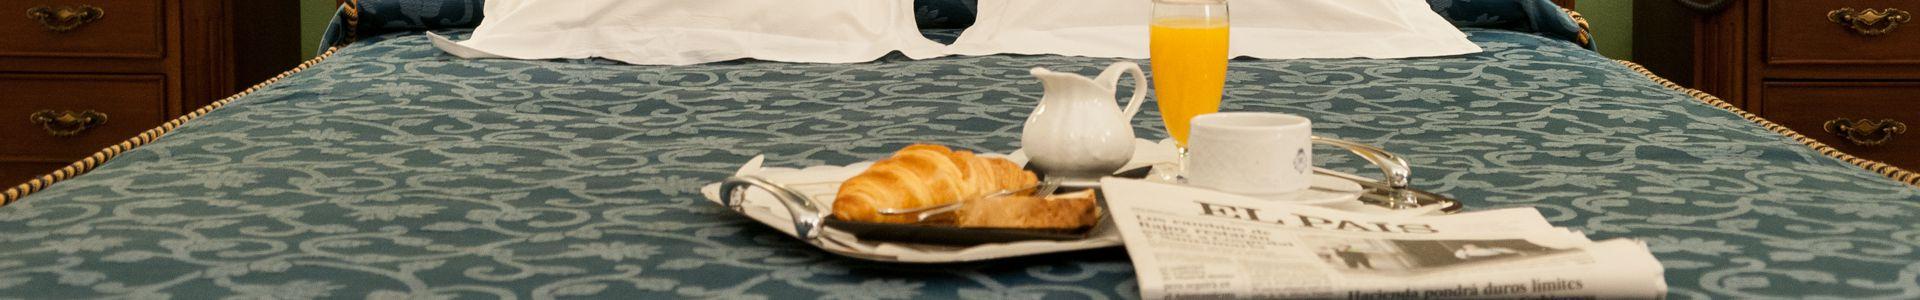 Sevilla Hotel Services